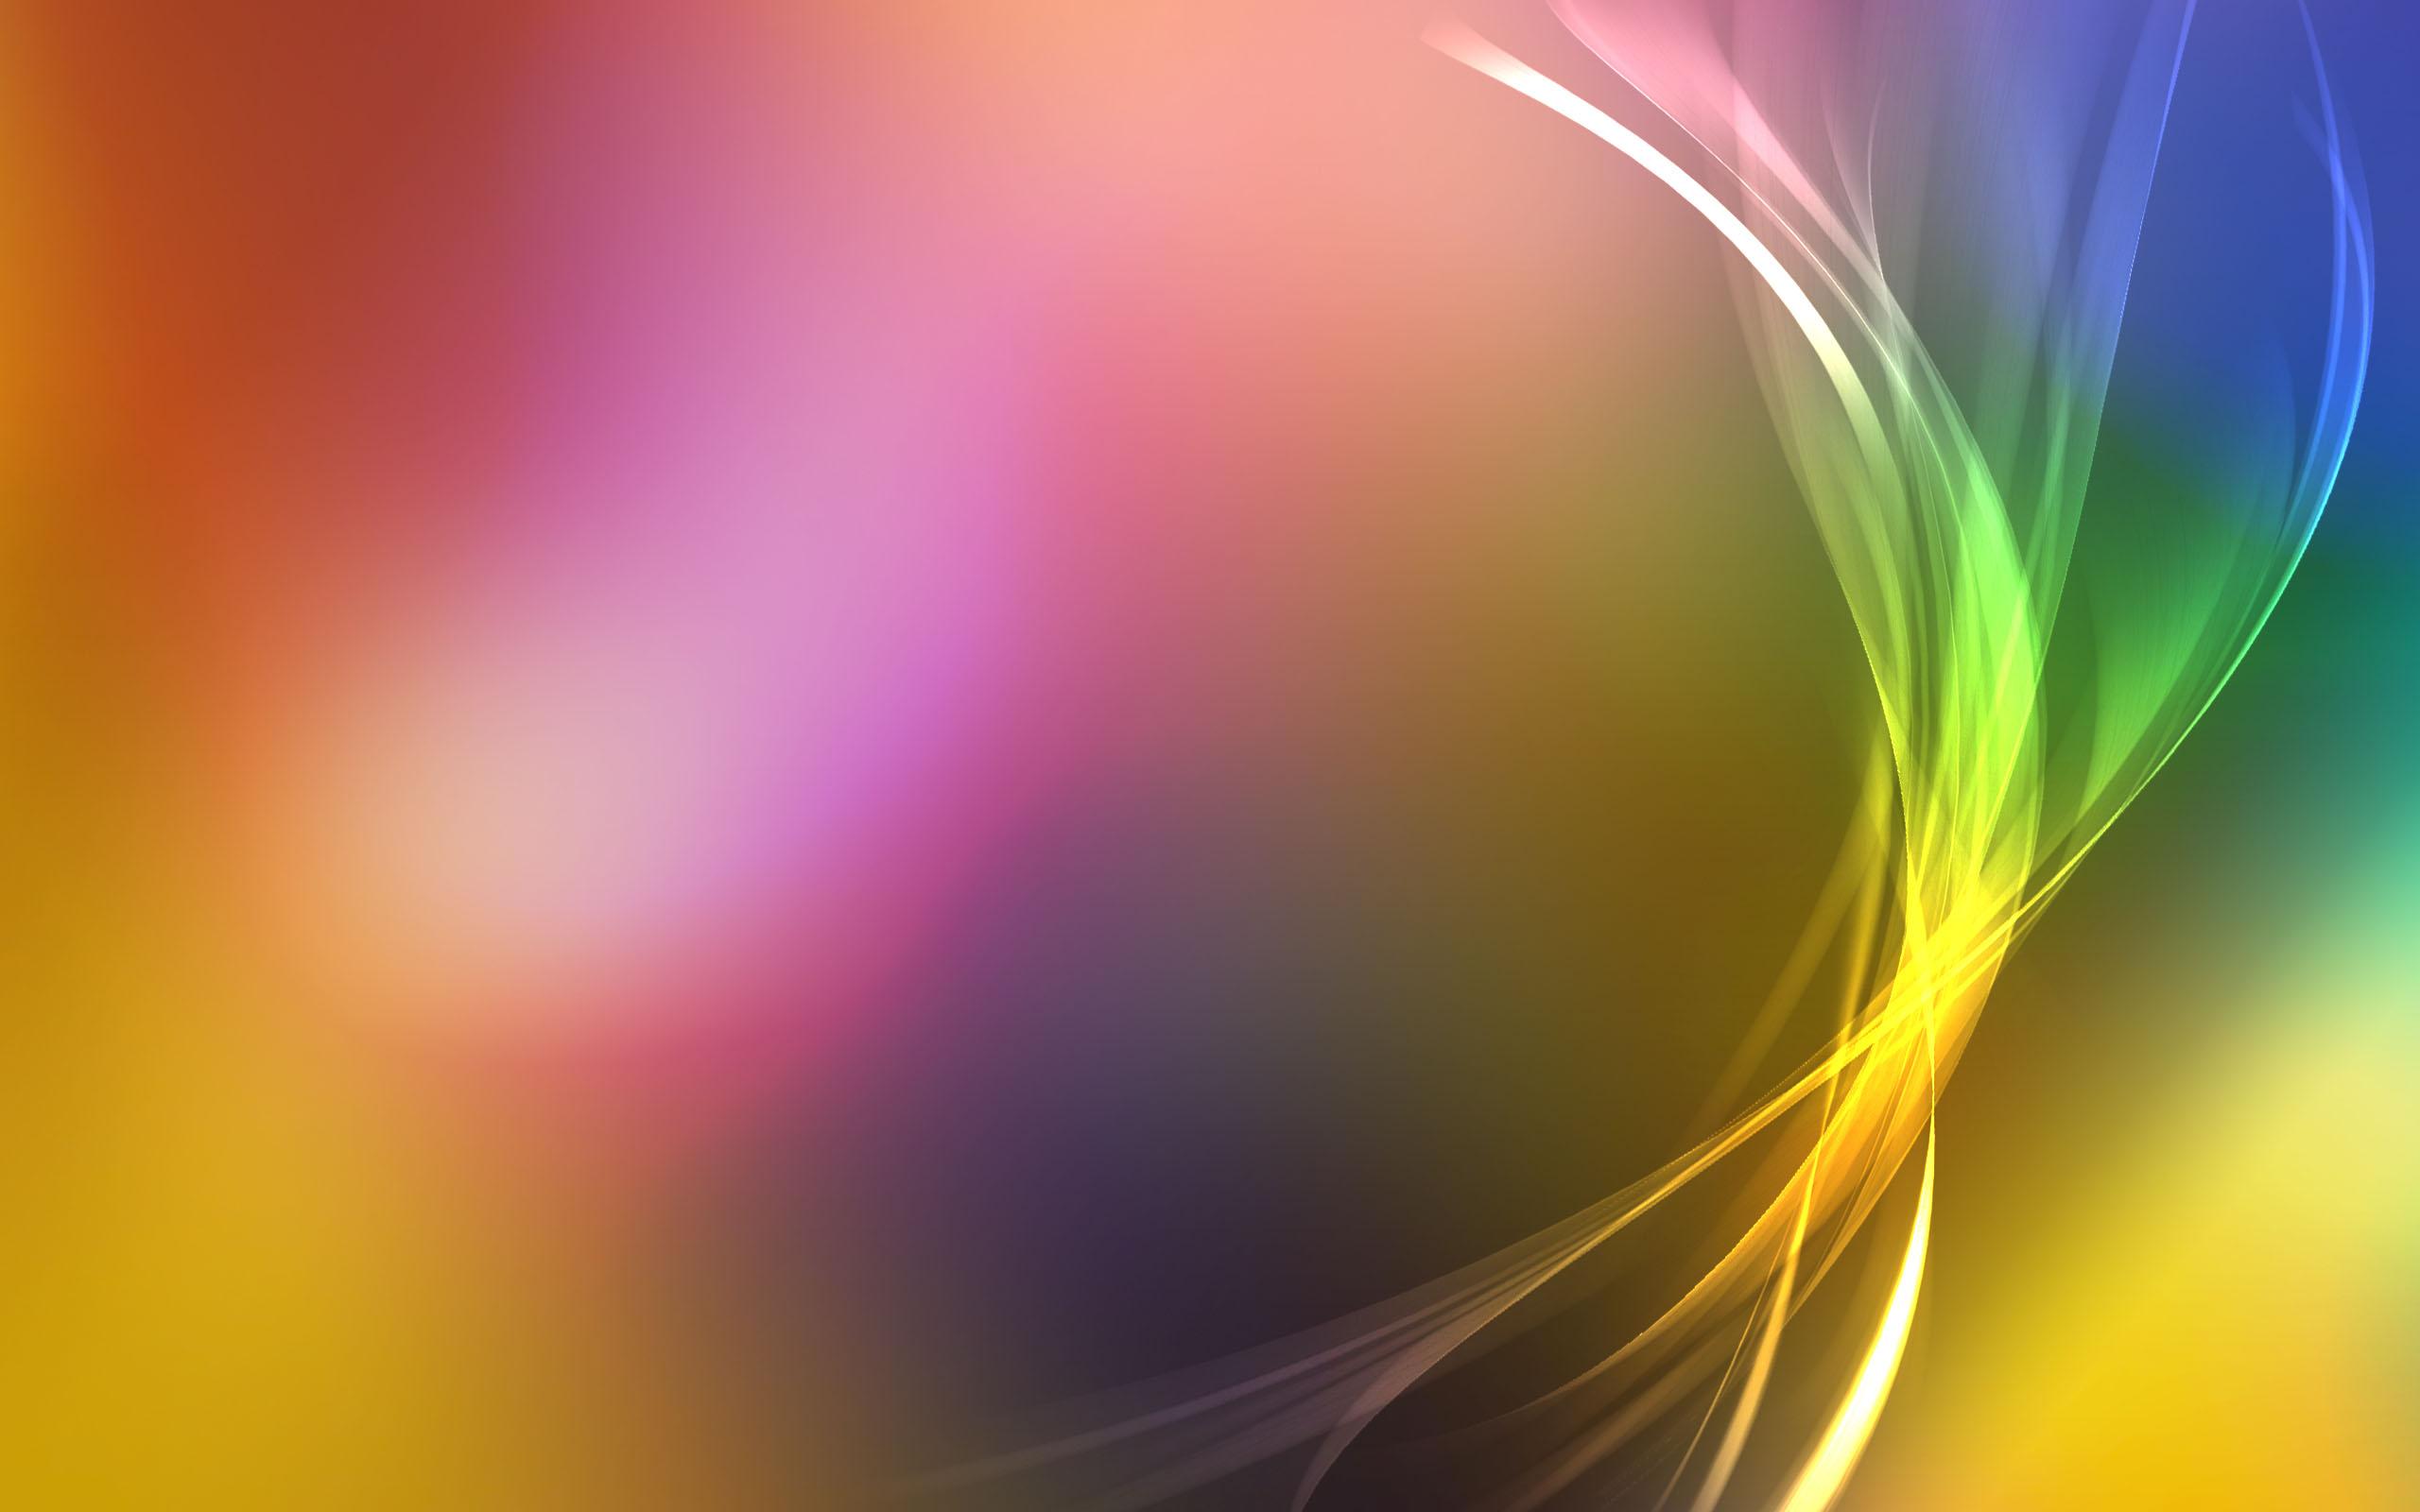 wallpaper Colorful Wallpapers hd wallpaper background desktop 2560x1600